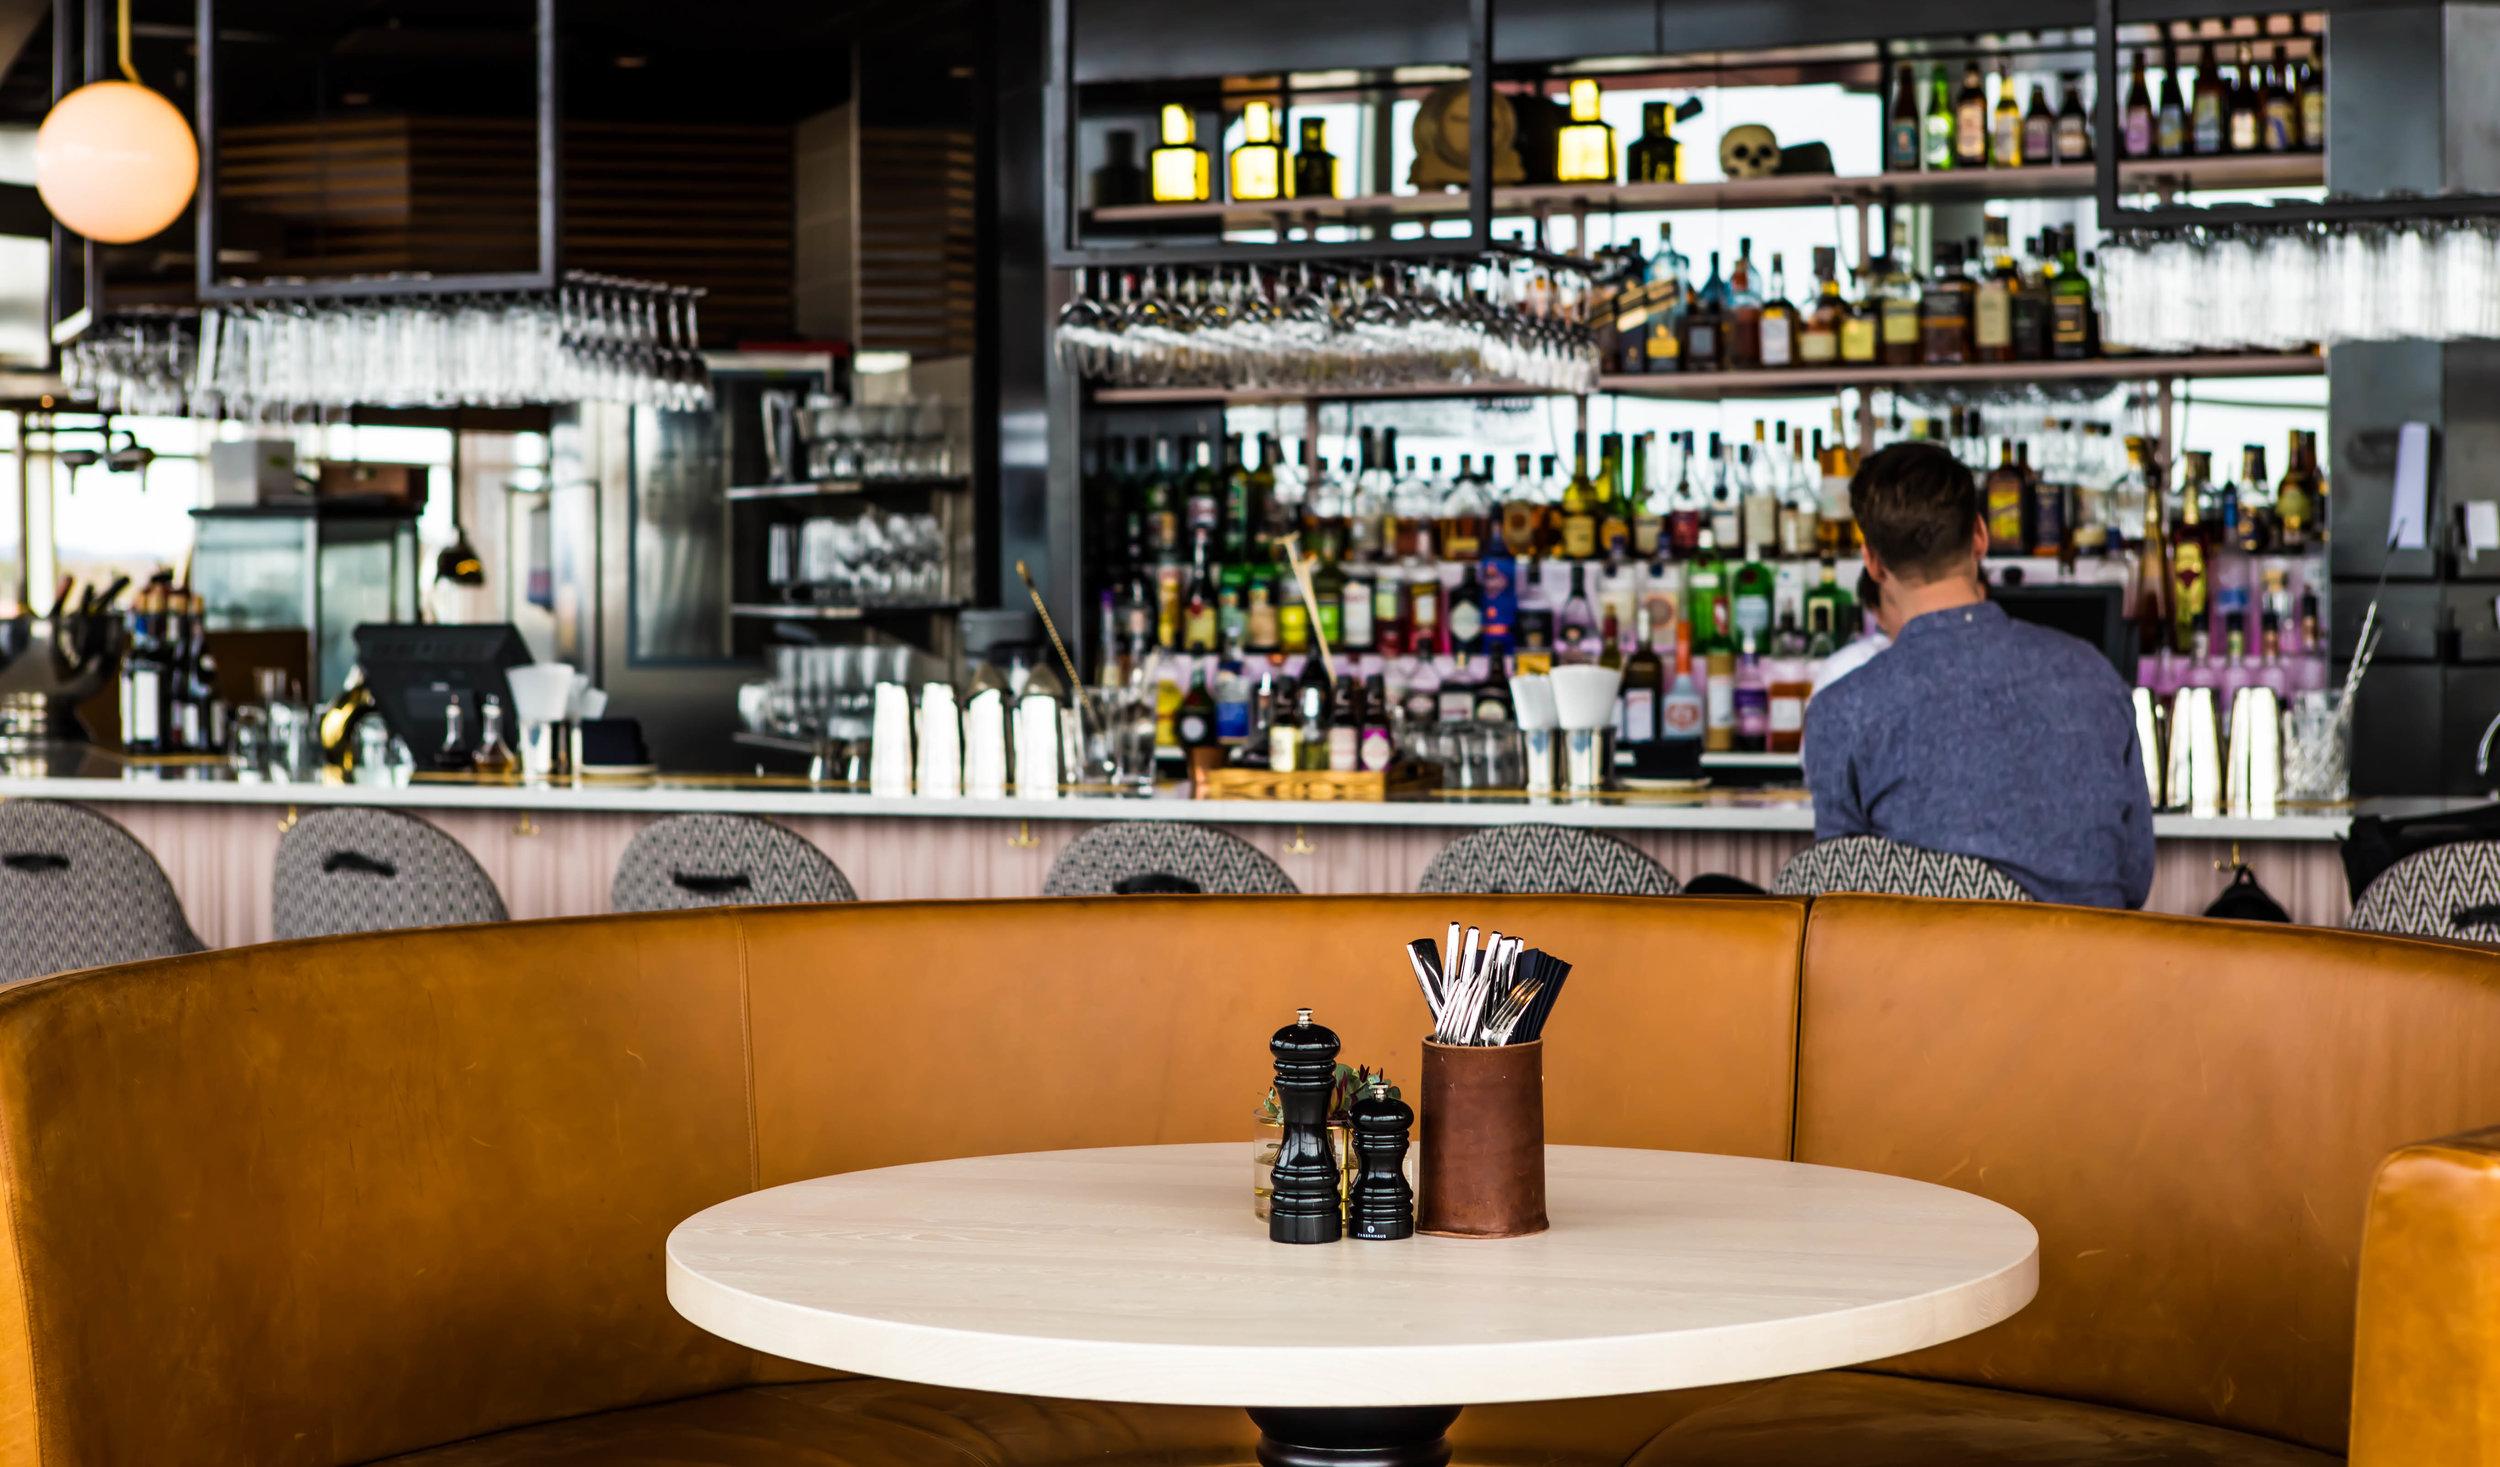 Sofa-restaurant-Heaven23-Gothenburg-Sweden-Facctory-photographer-Julio-Chang-5.jpg